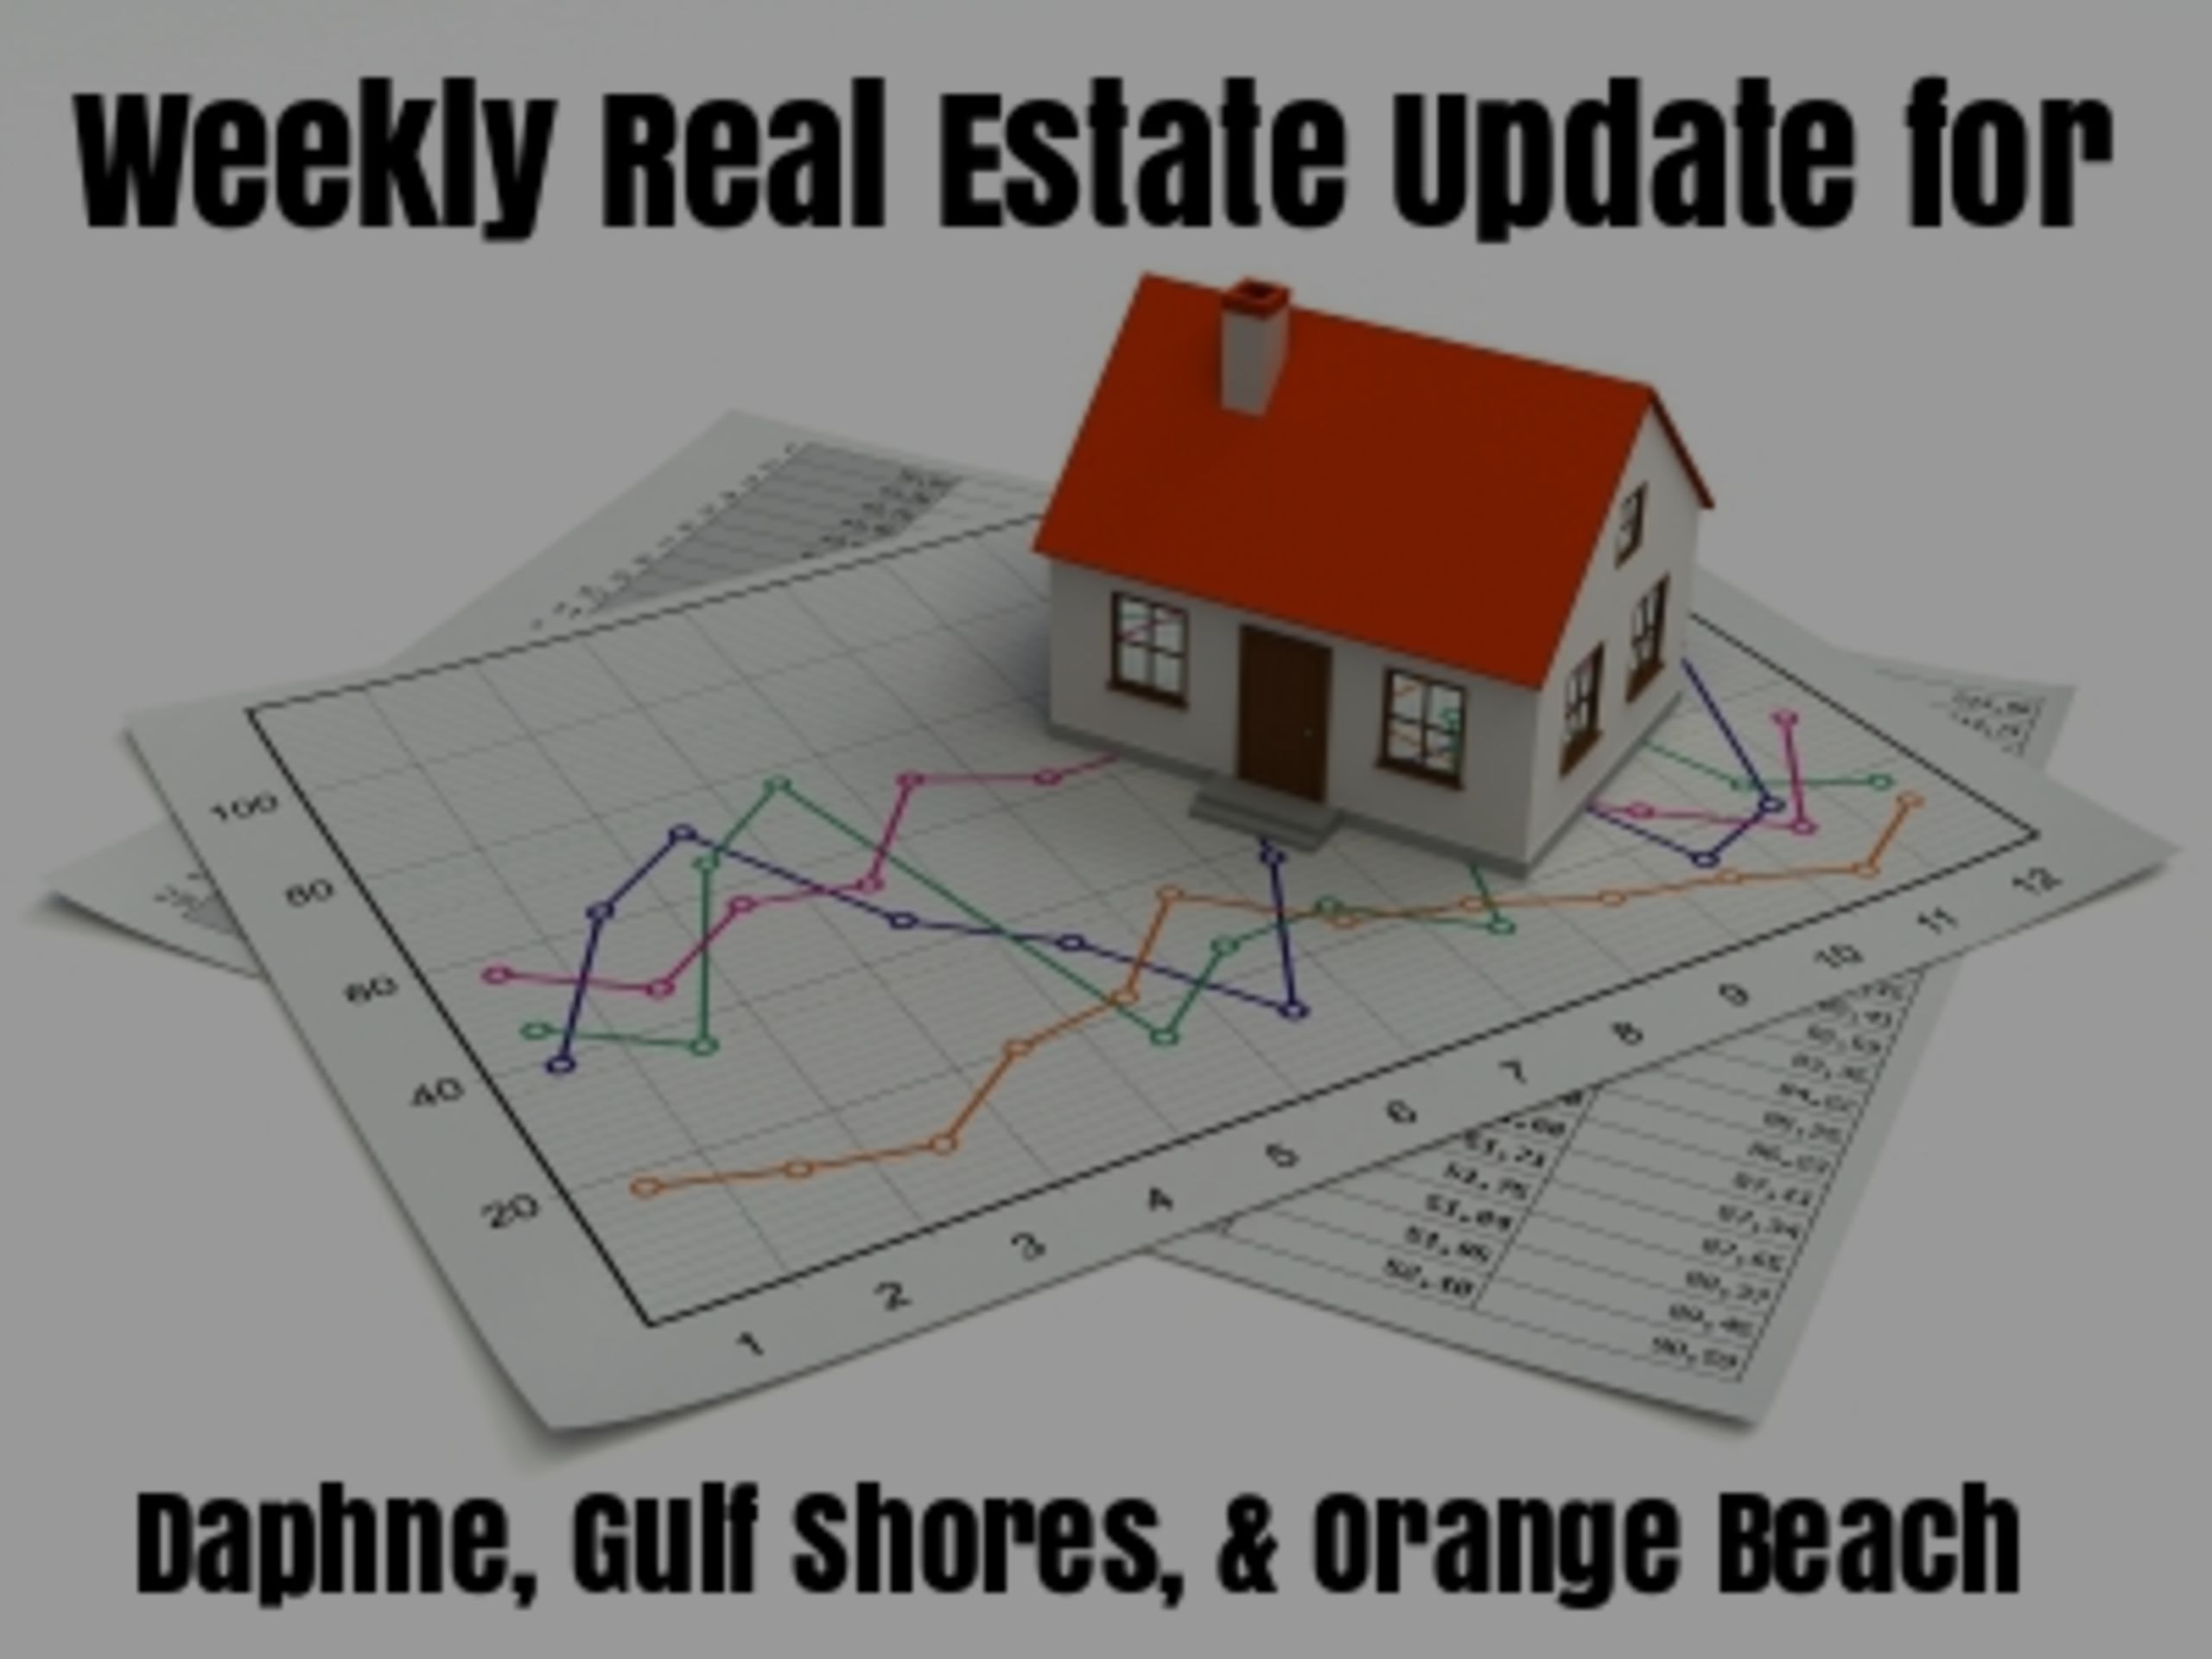 Weekly Real Estate Update – Daphne, Gulf Shores, and Orange Beach – 10/9/17